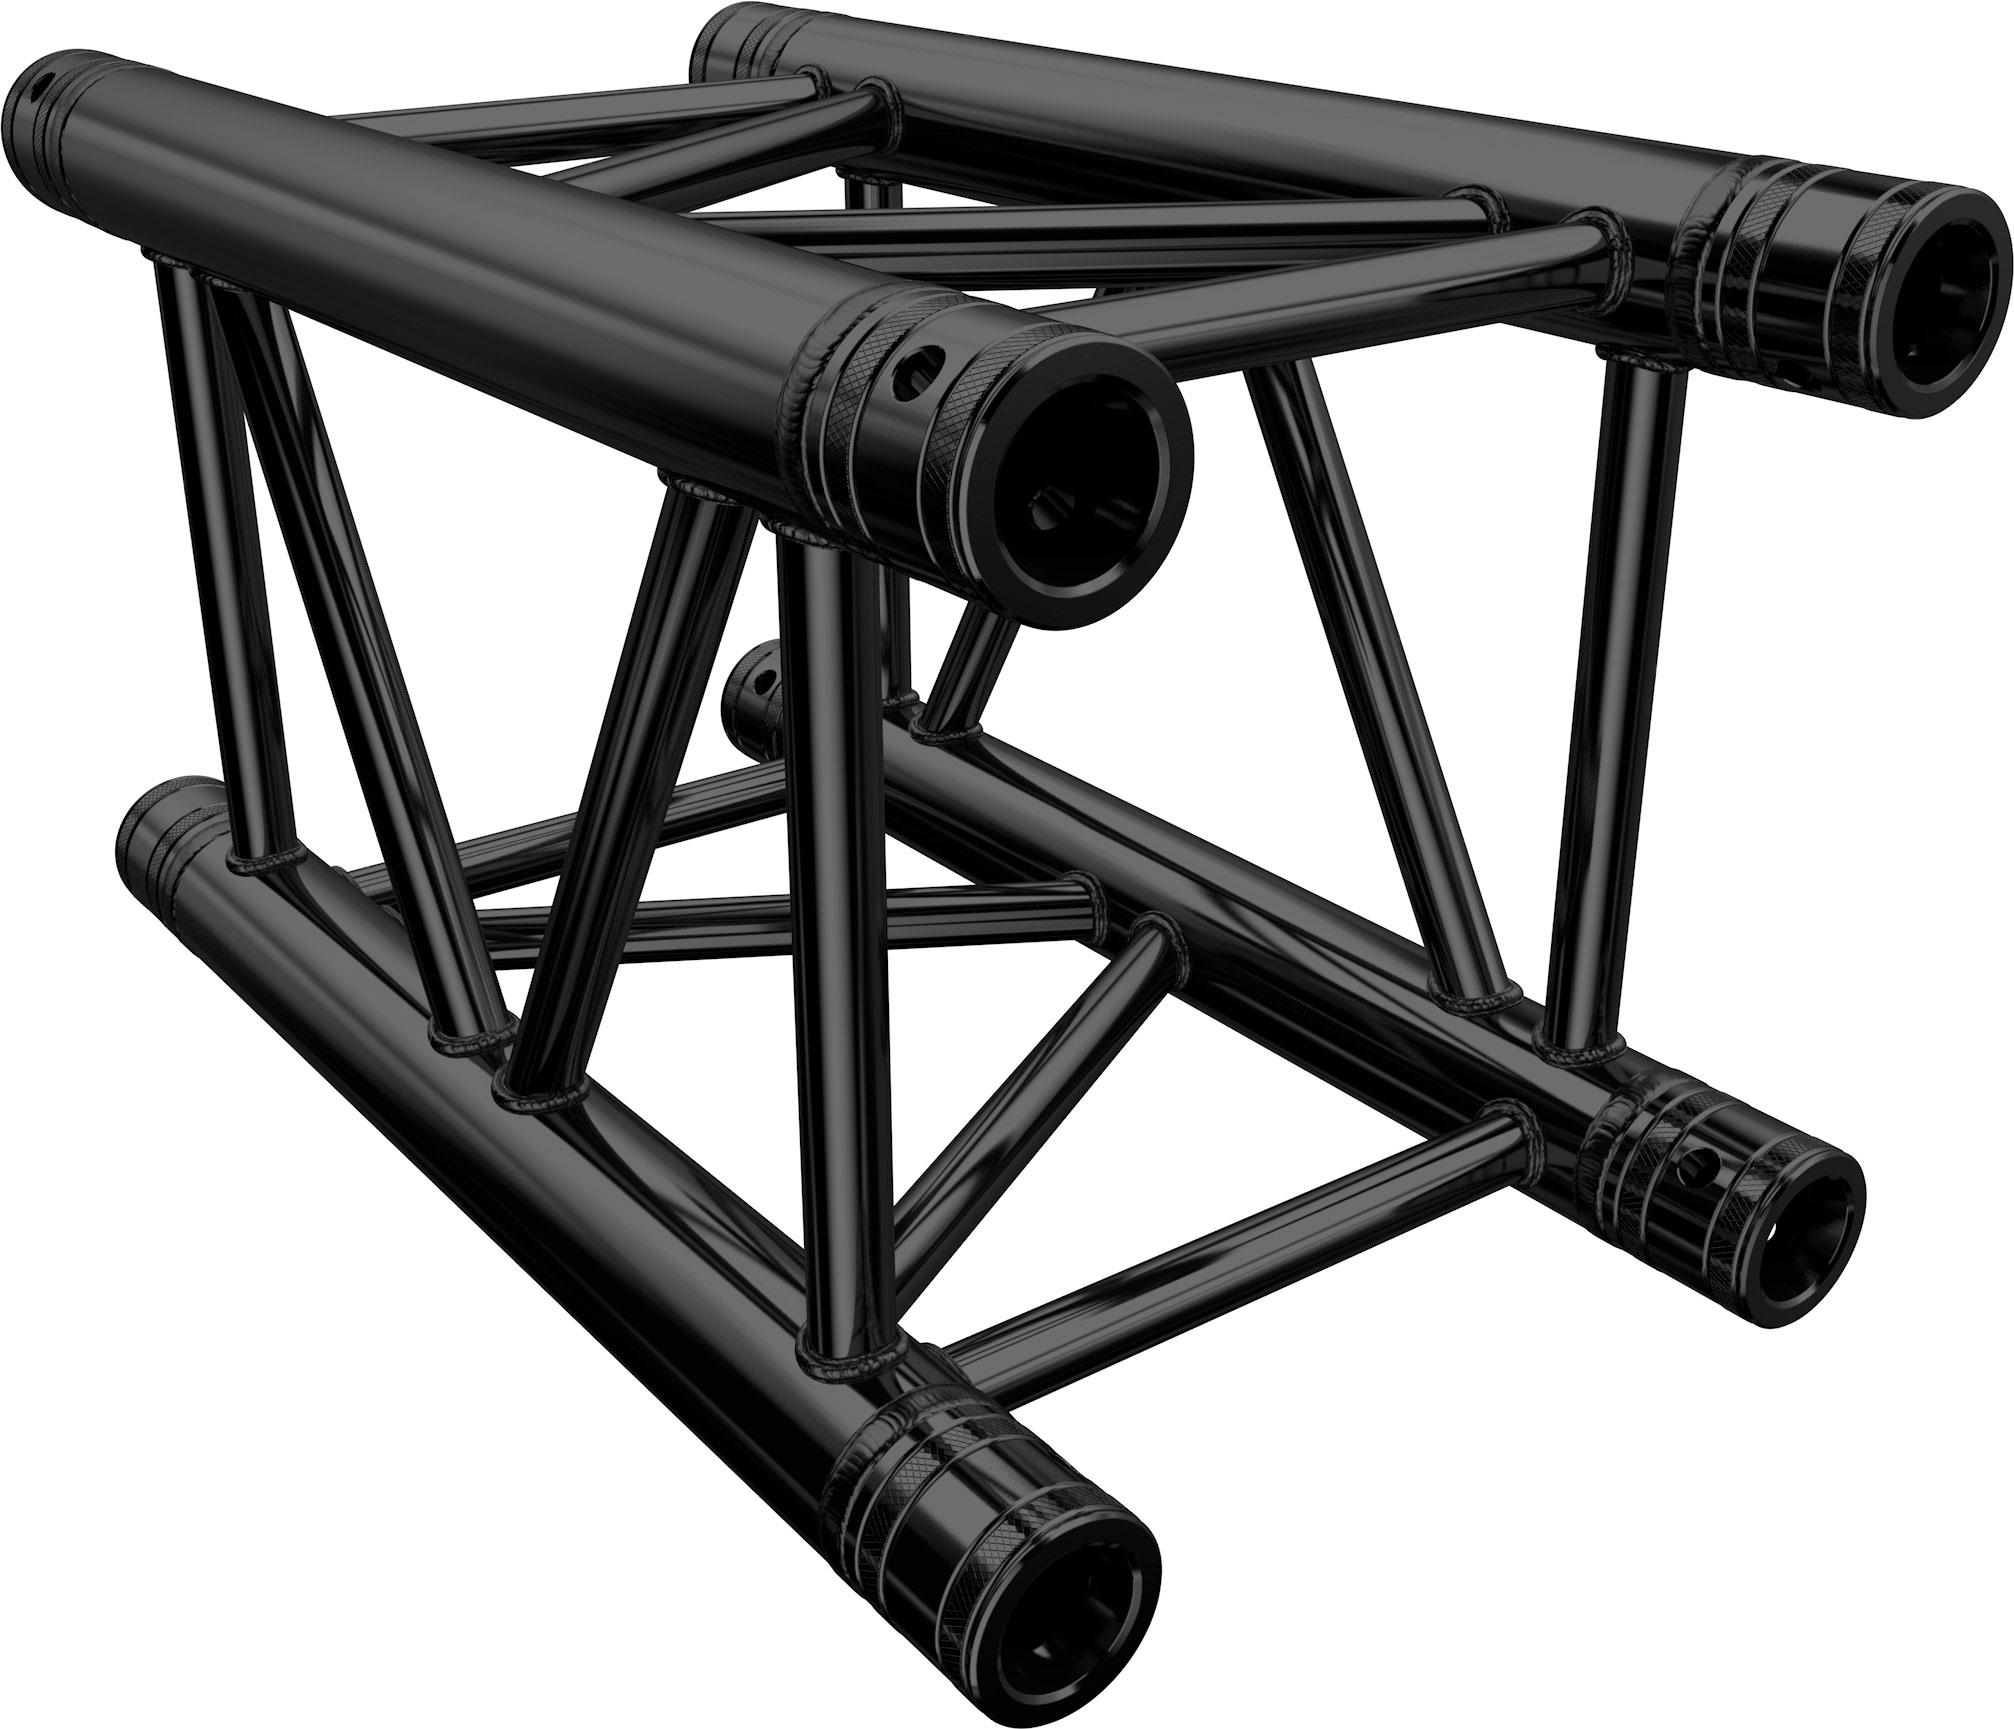 Global Truss Traverse F34 50 cm Stage Black